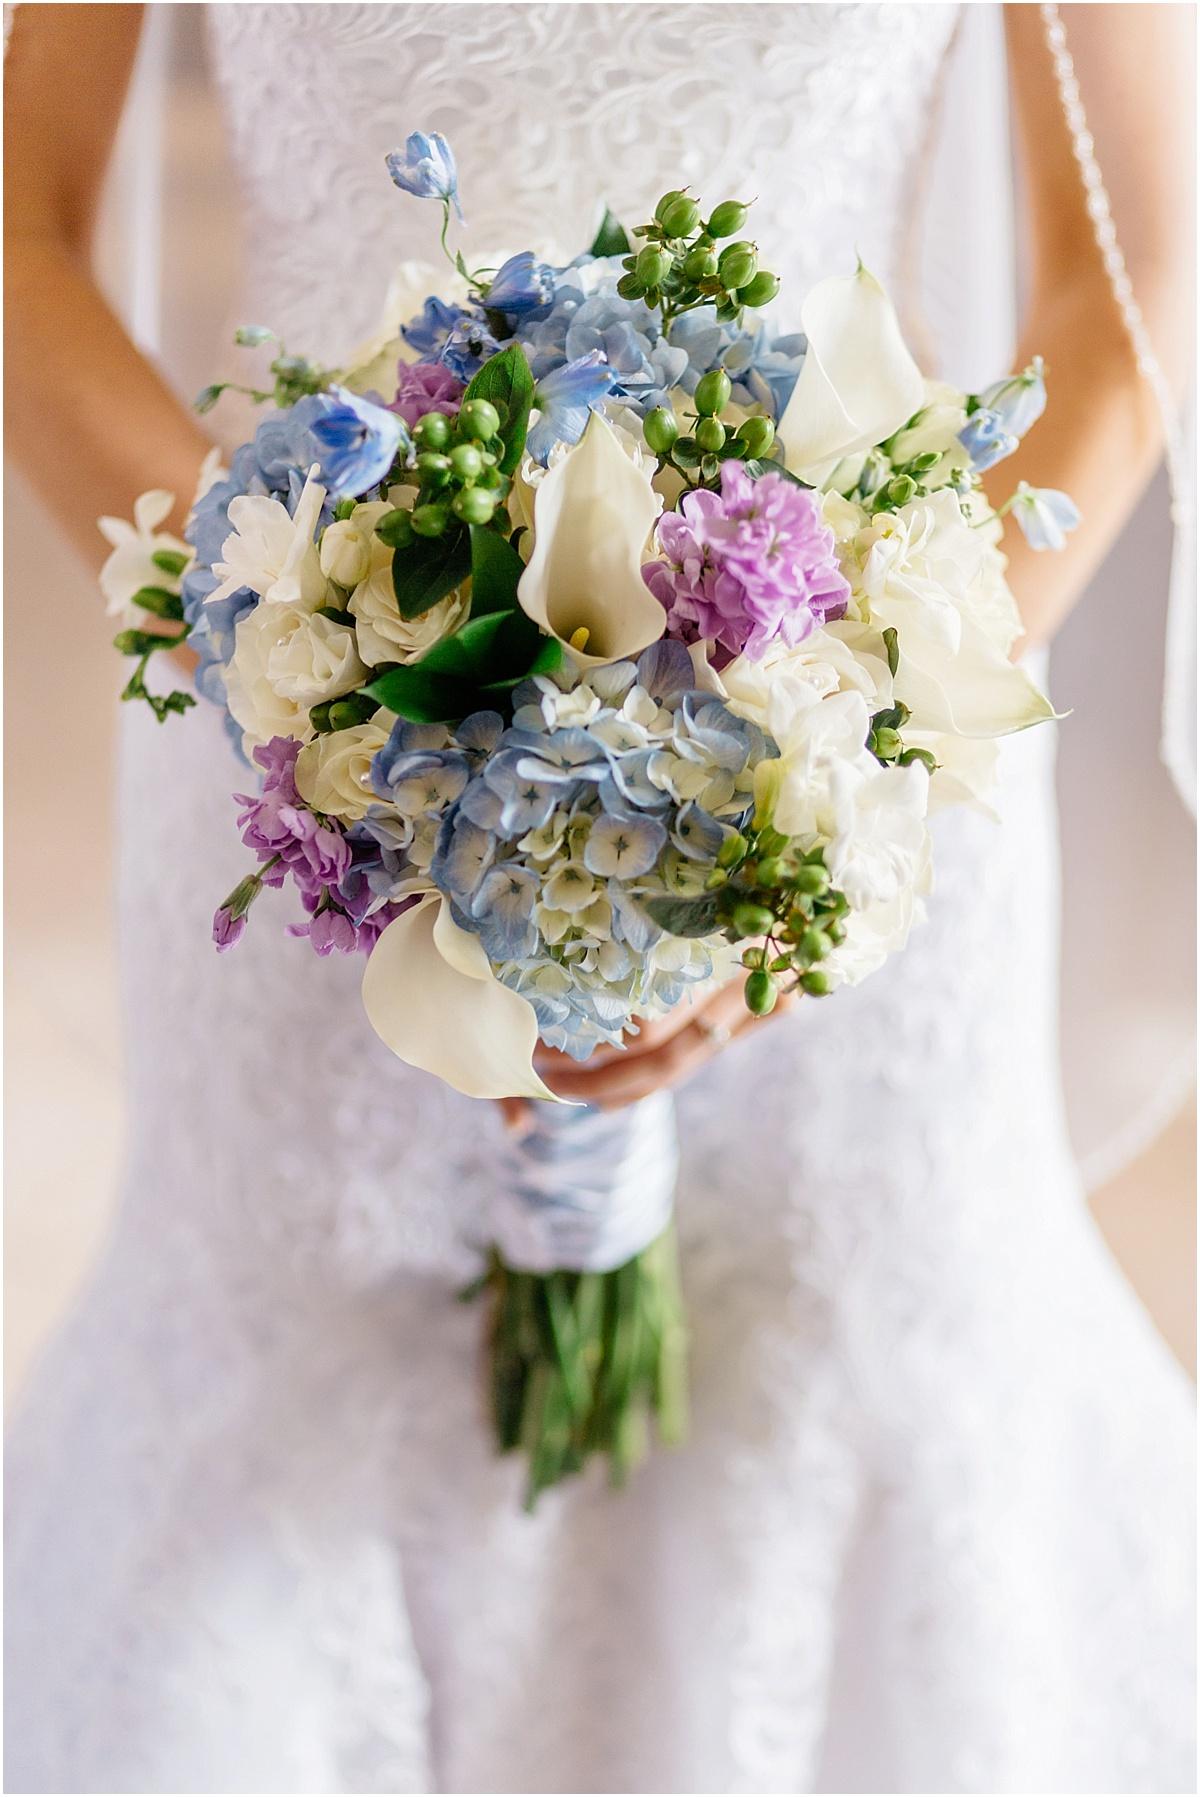 Benvenuto_Wedding_Jessica_Cedric_Sonju_0019